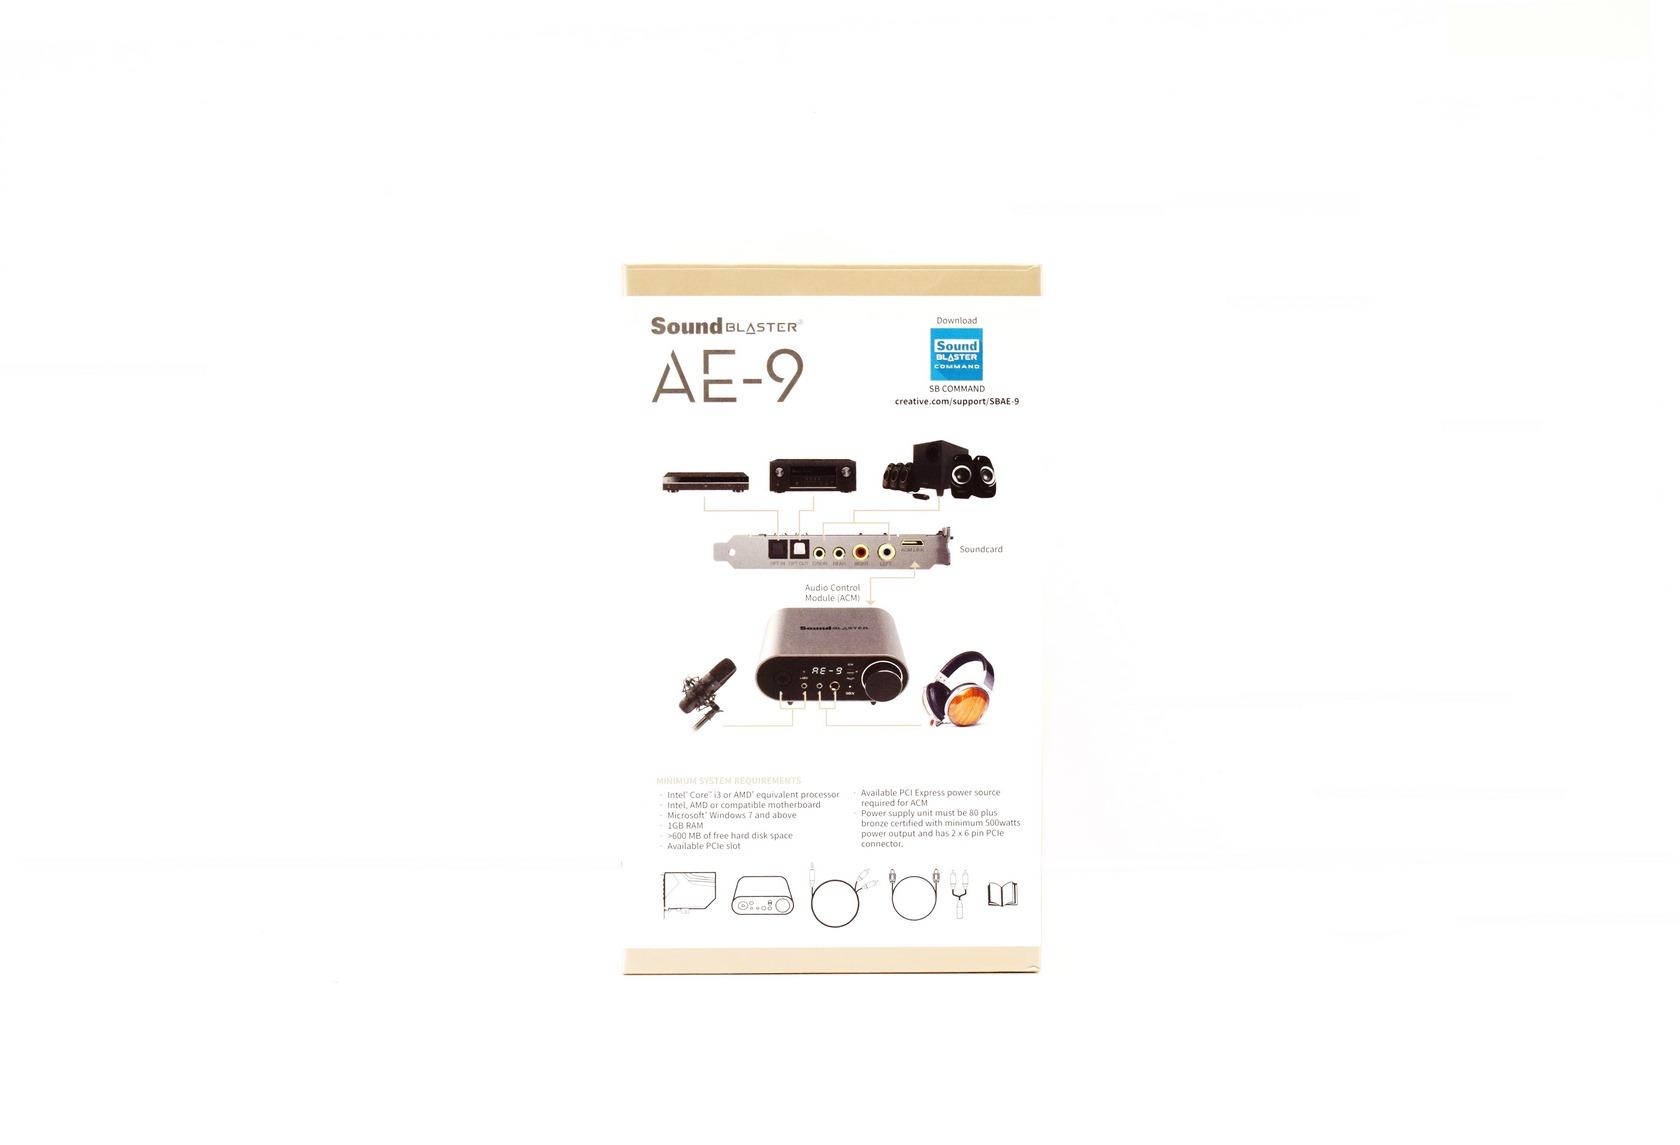 Creative Sound Blaster Ae 9 Hi Res Pcie Sound Card Review